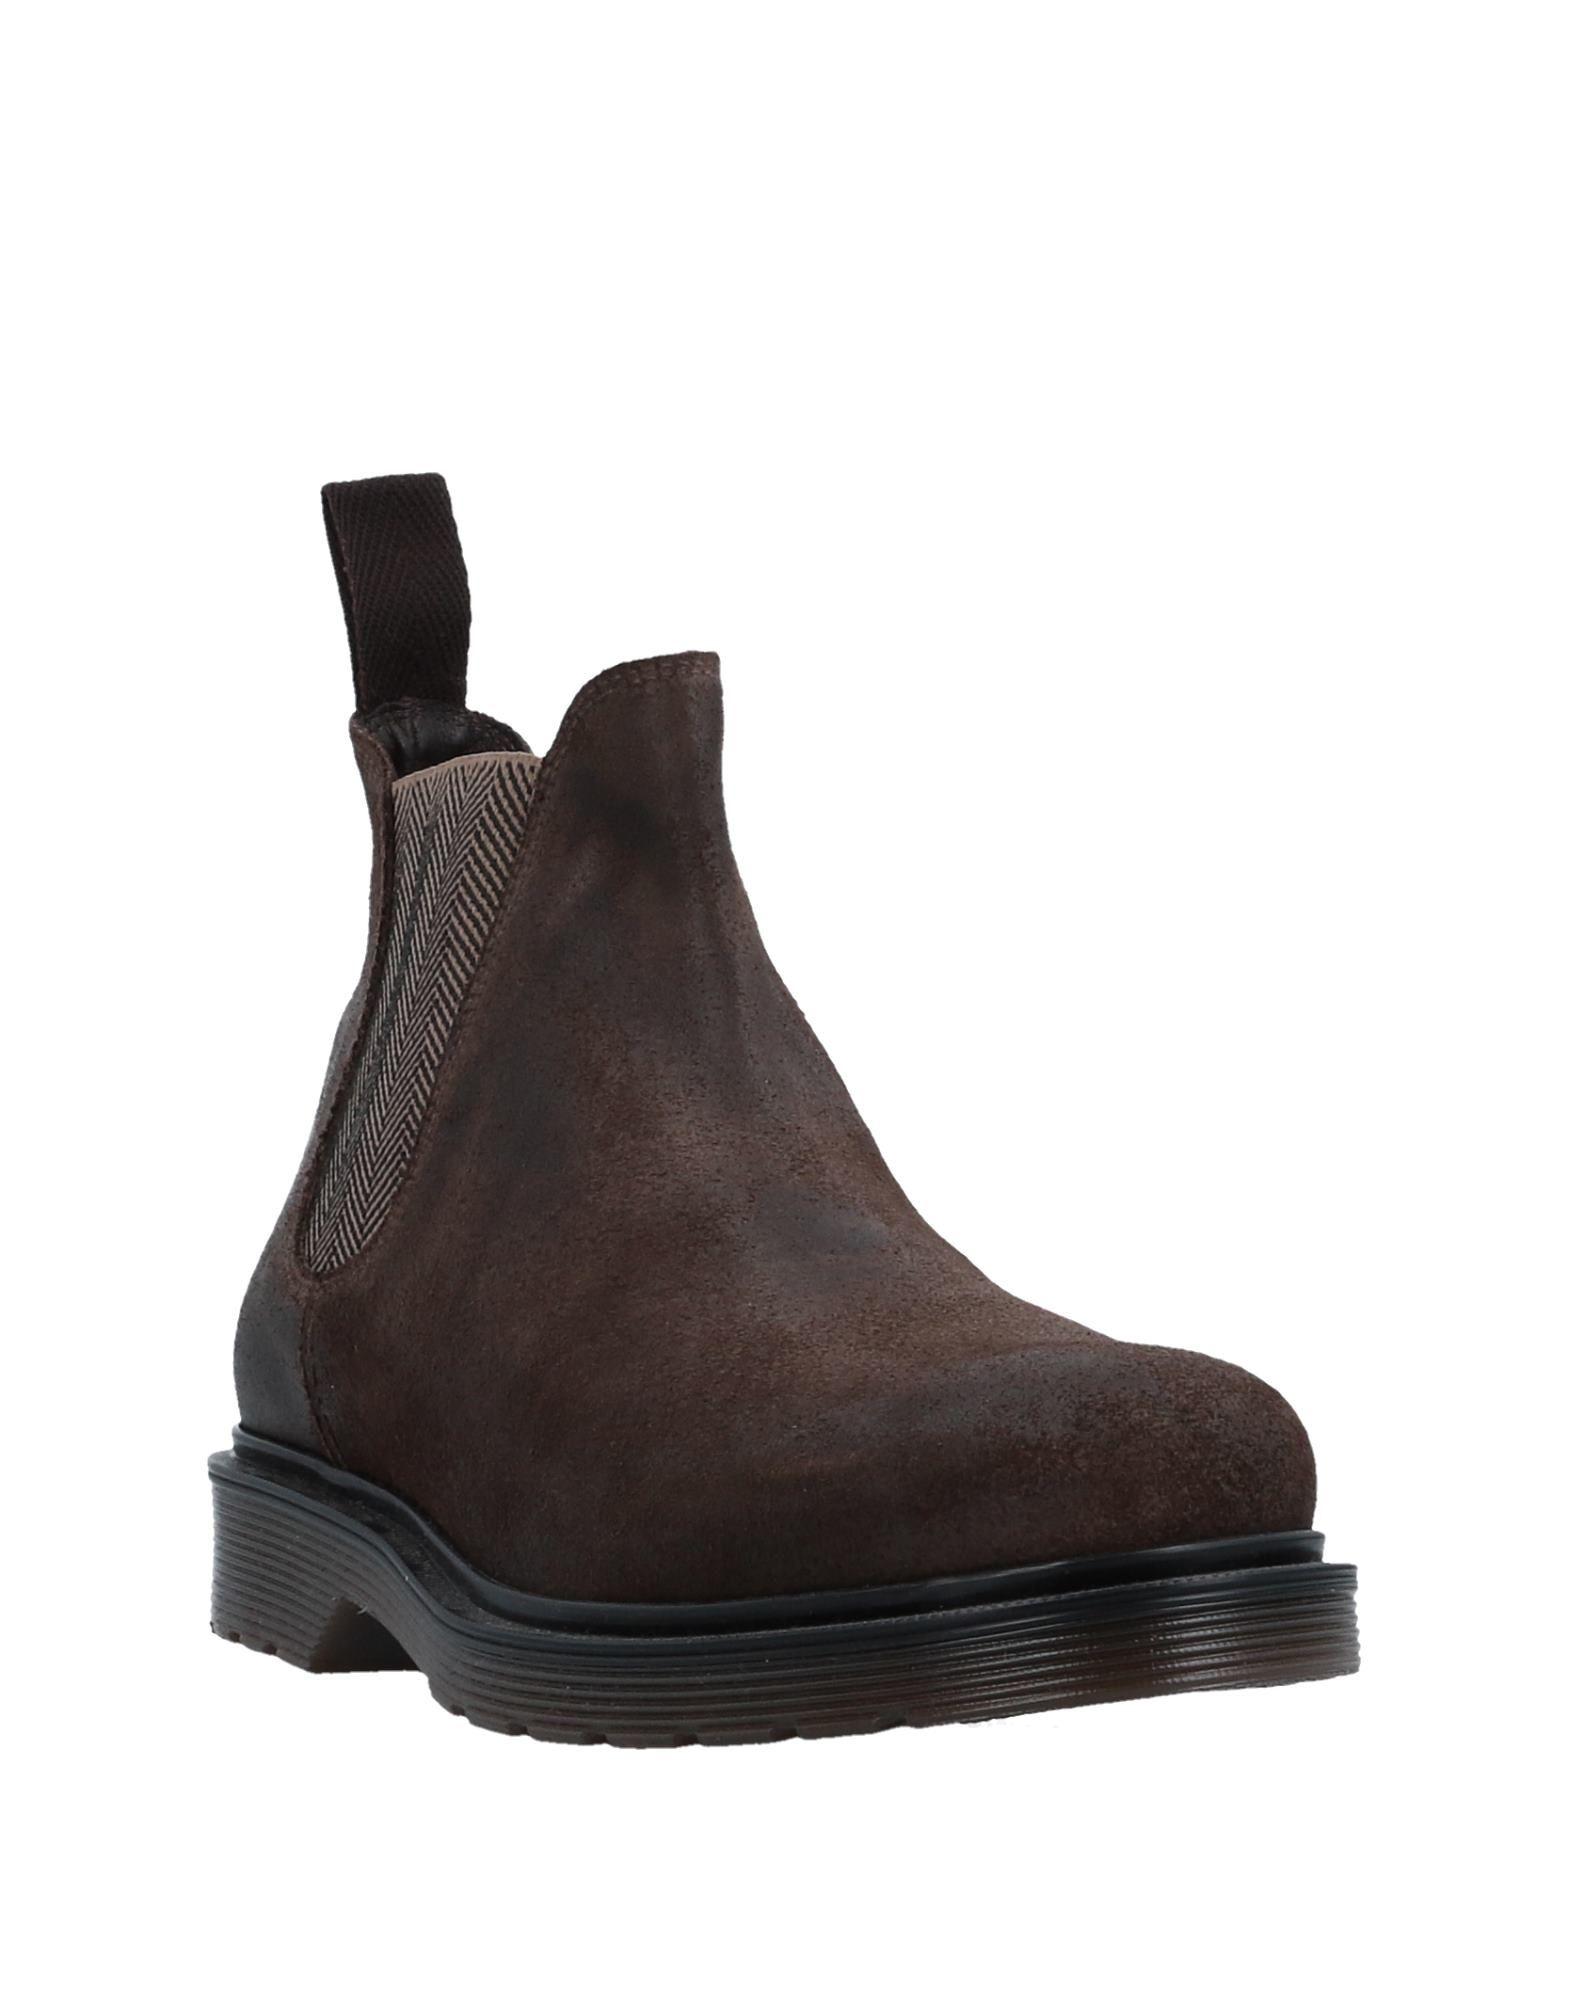 Rabatt echte  Schuhe Davidson Stiefelette Herren  echte 11509989BU 791f3d